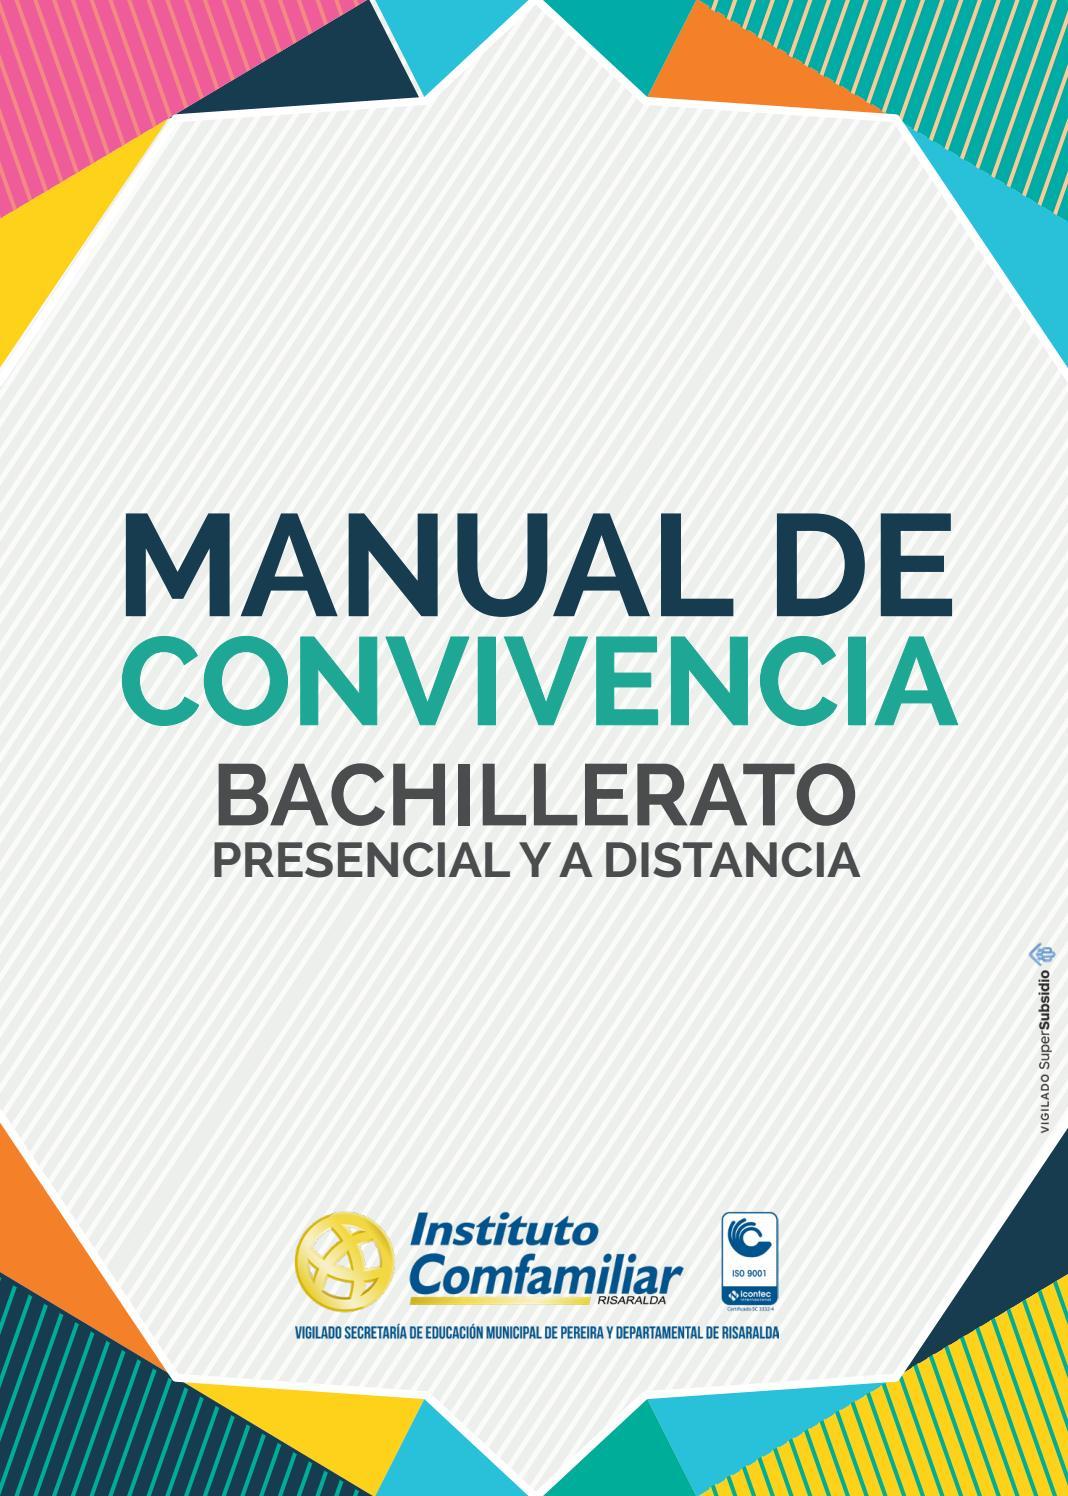 Manual de Convivencia by Comfamiliar Risaralda - issuu